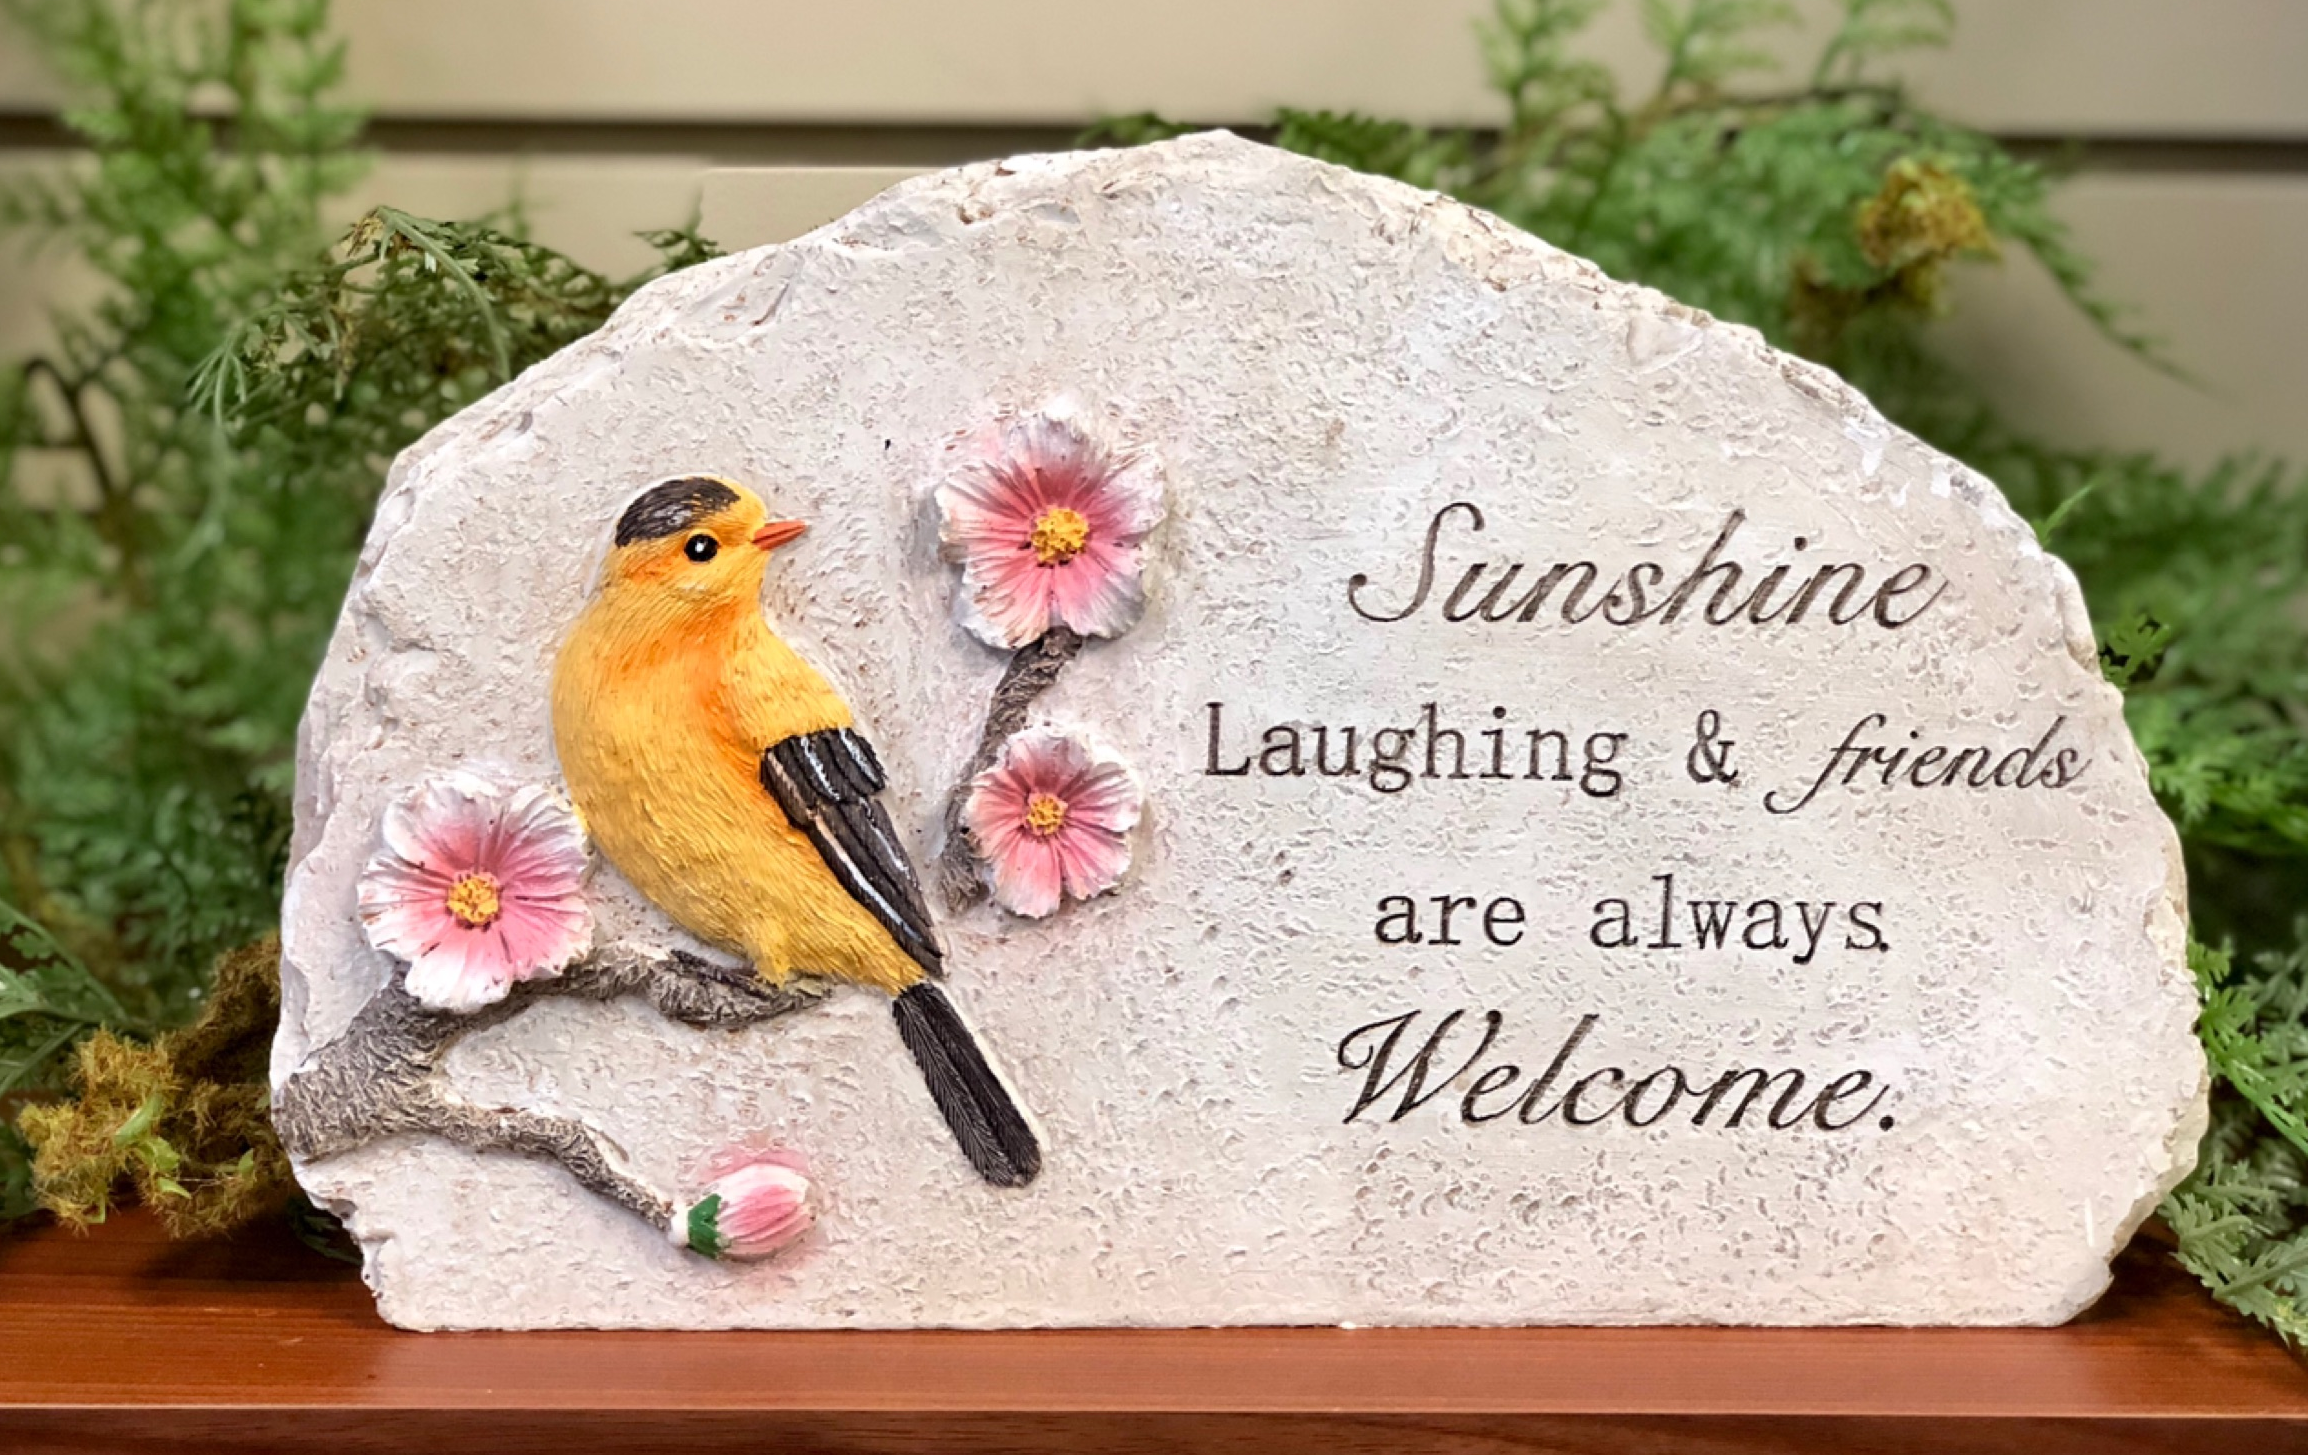 Home Decor & Gifts | Bird Watcher Supply Company